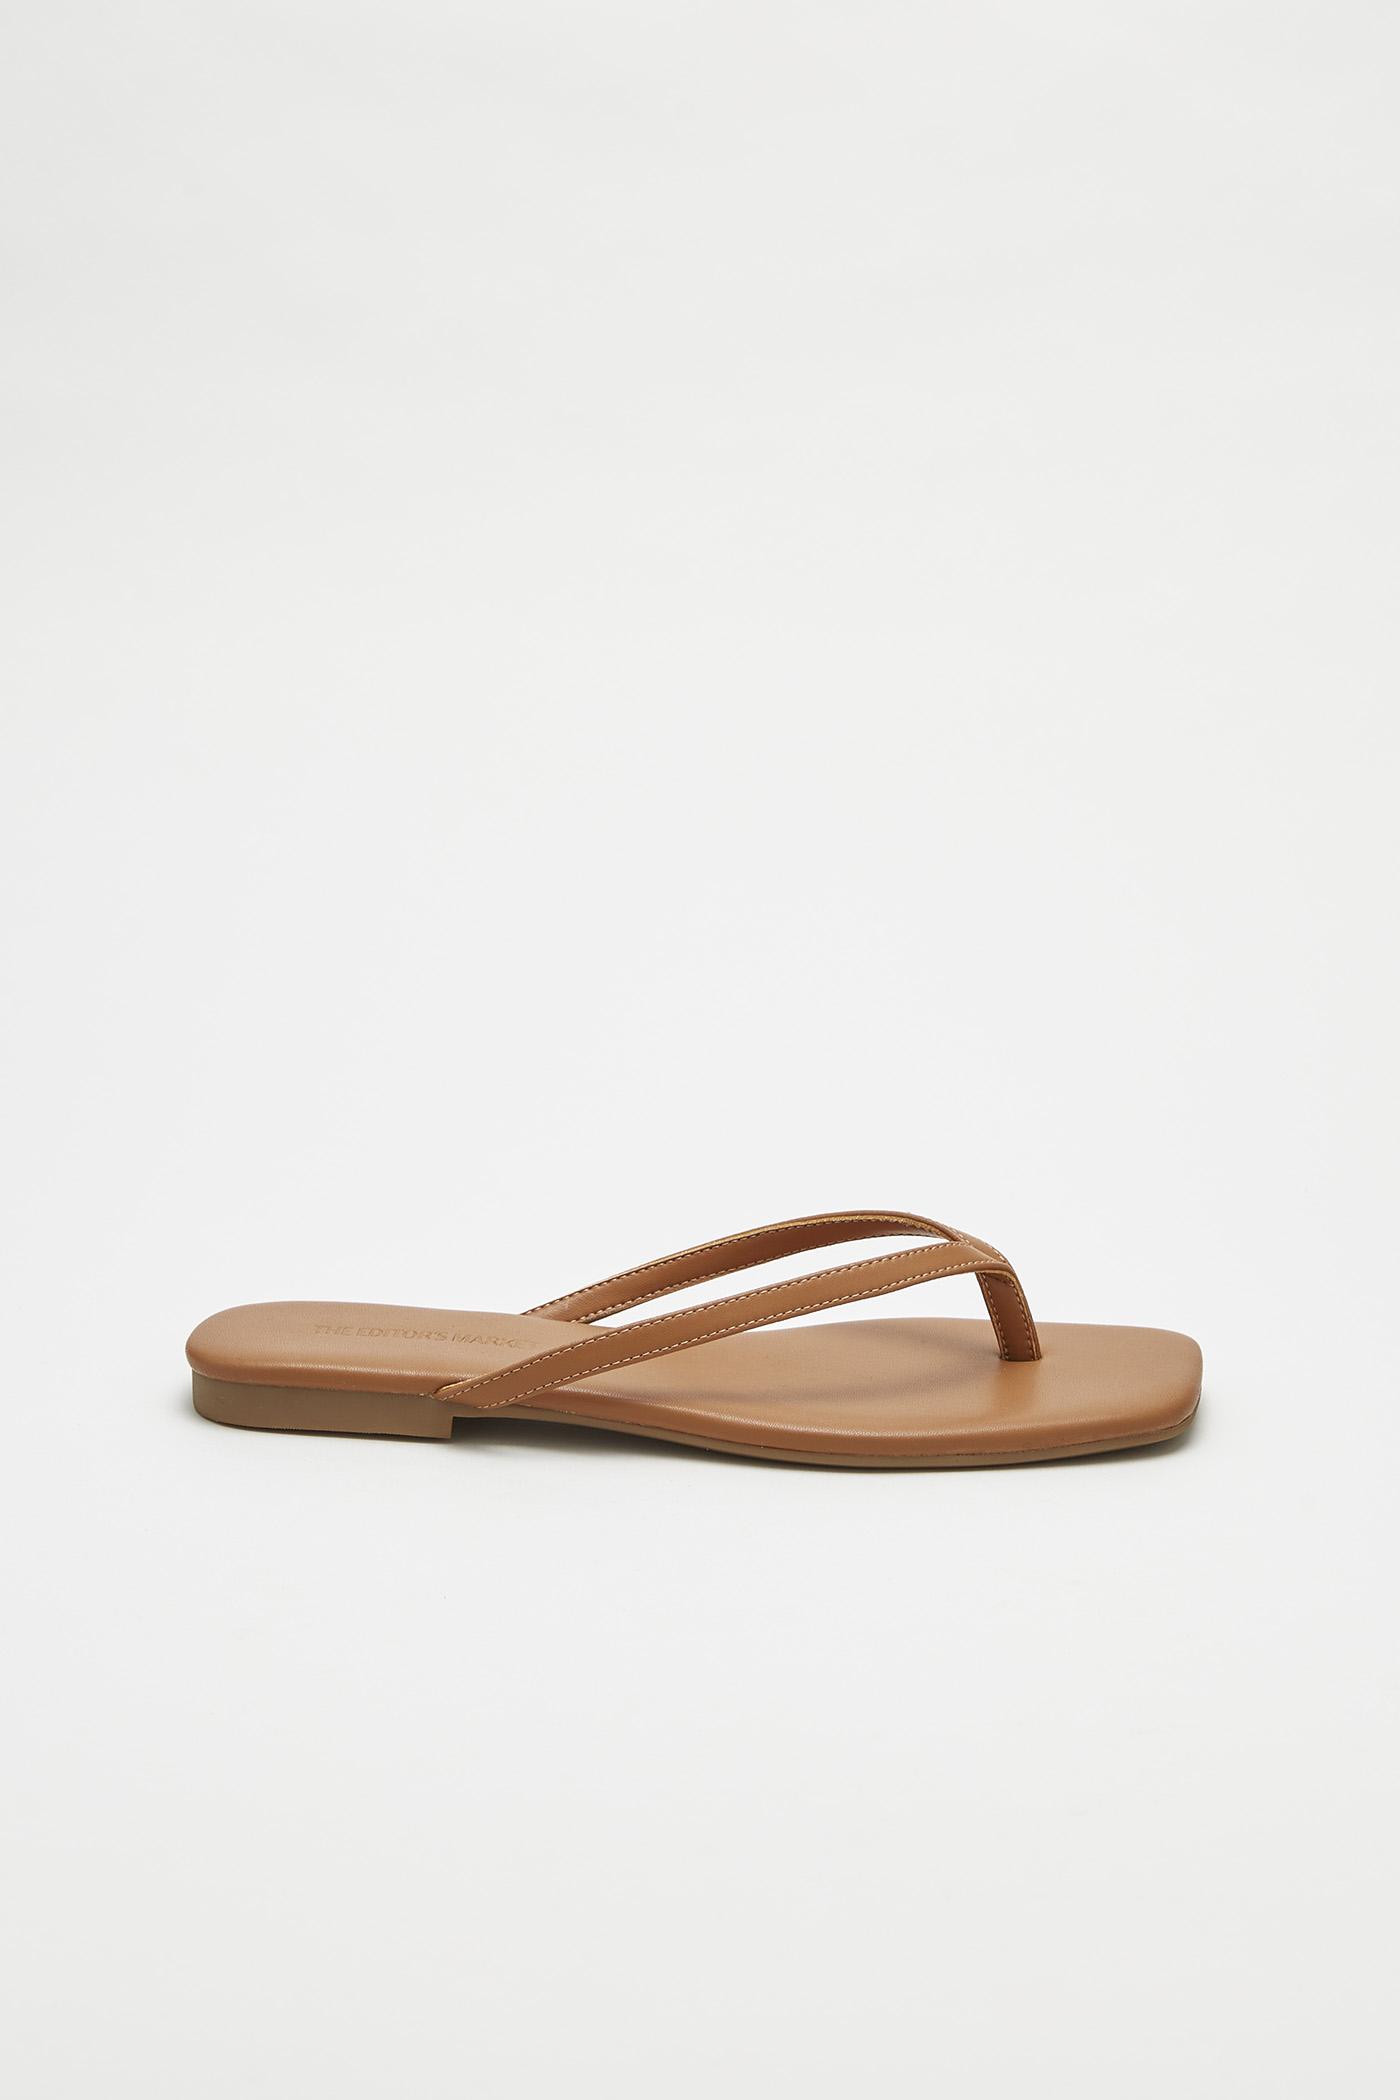 Althea Thong Slides